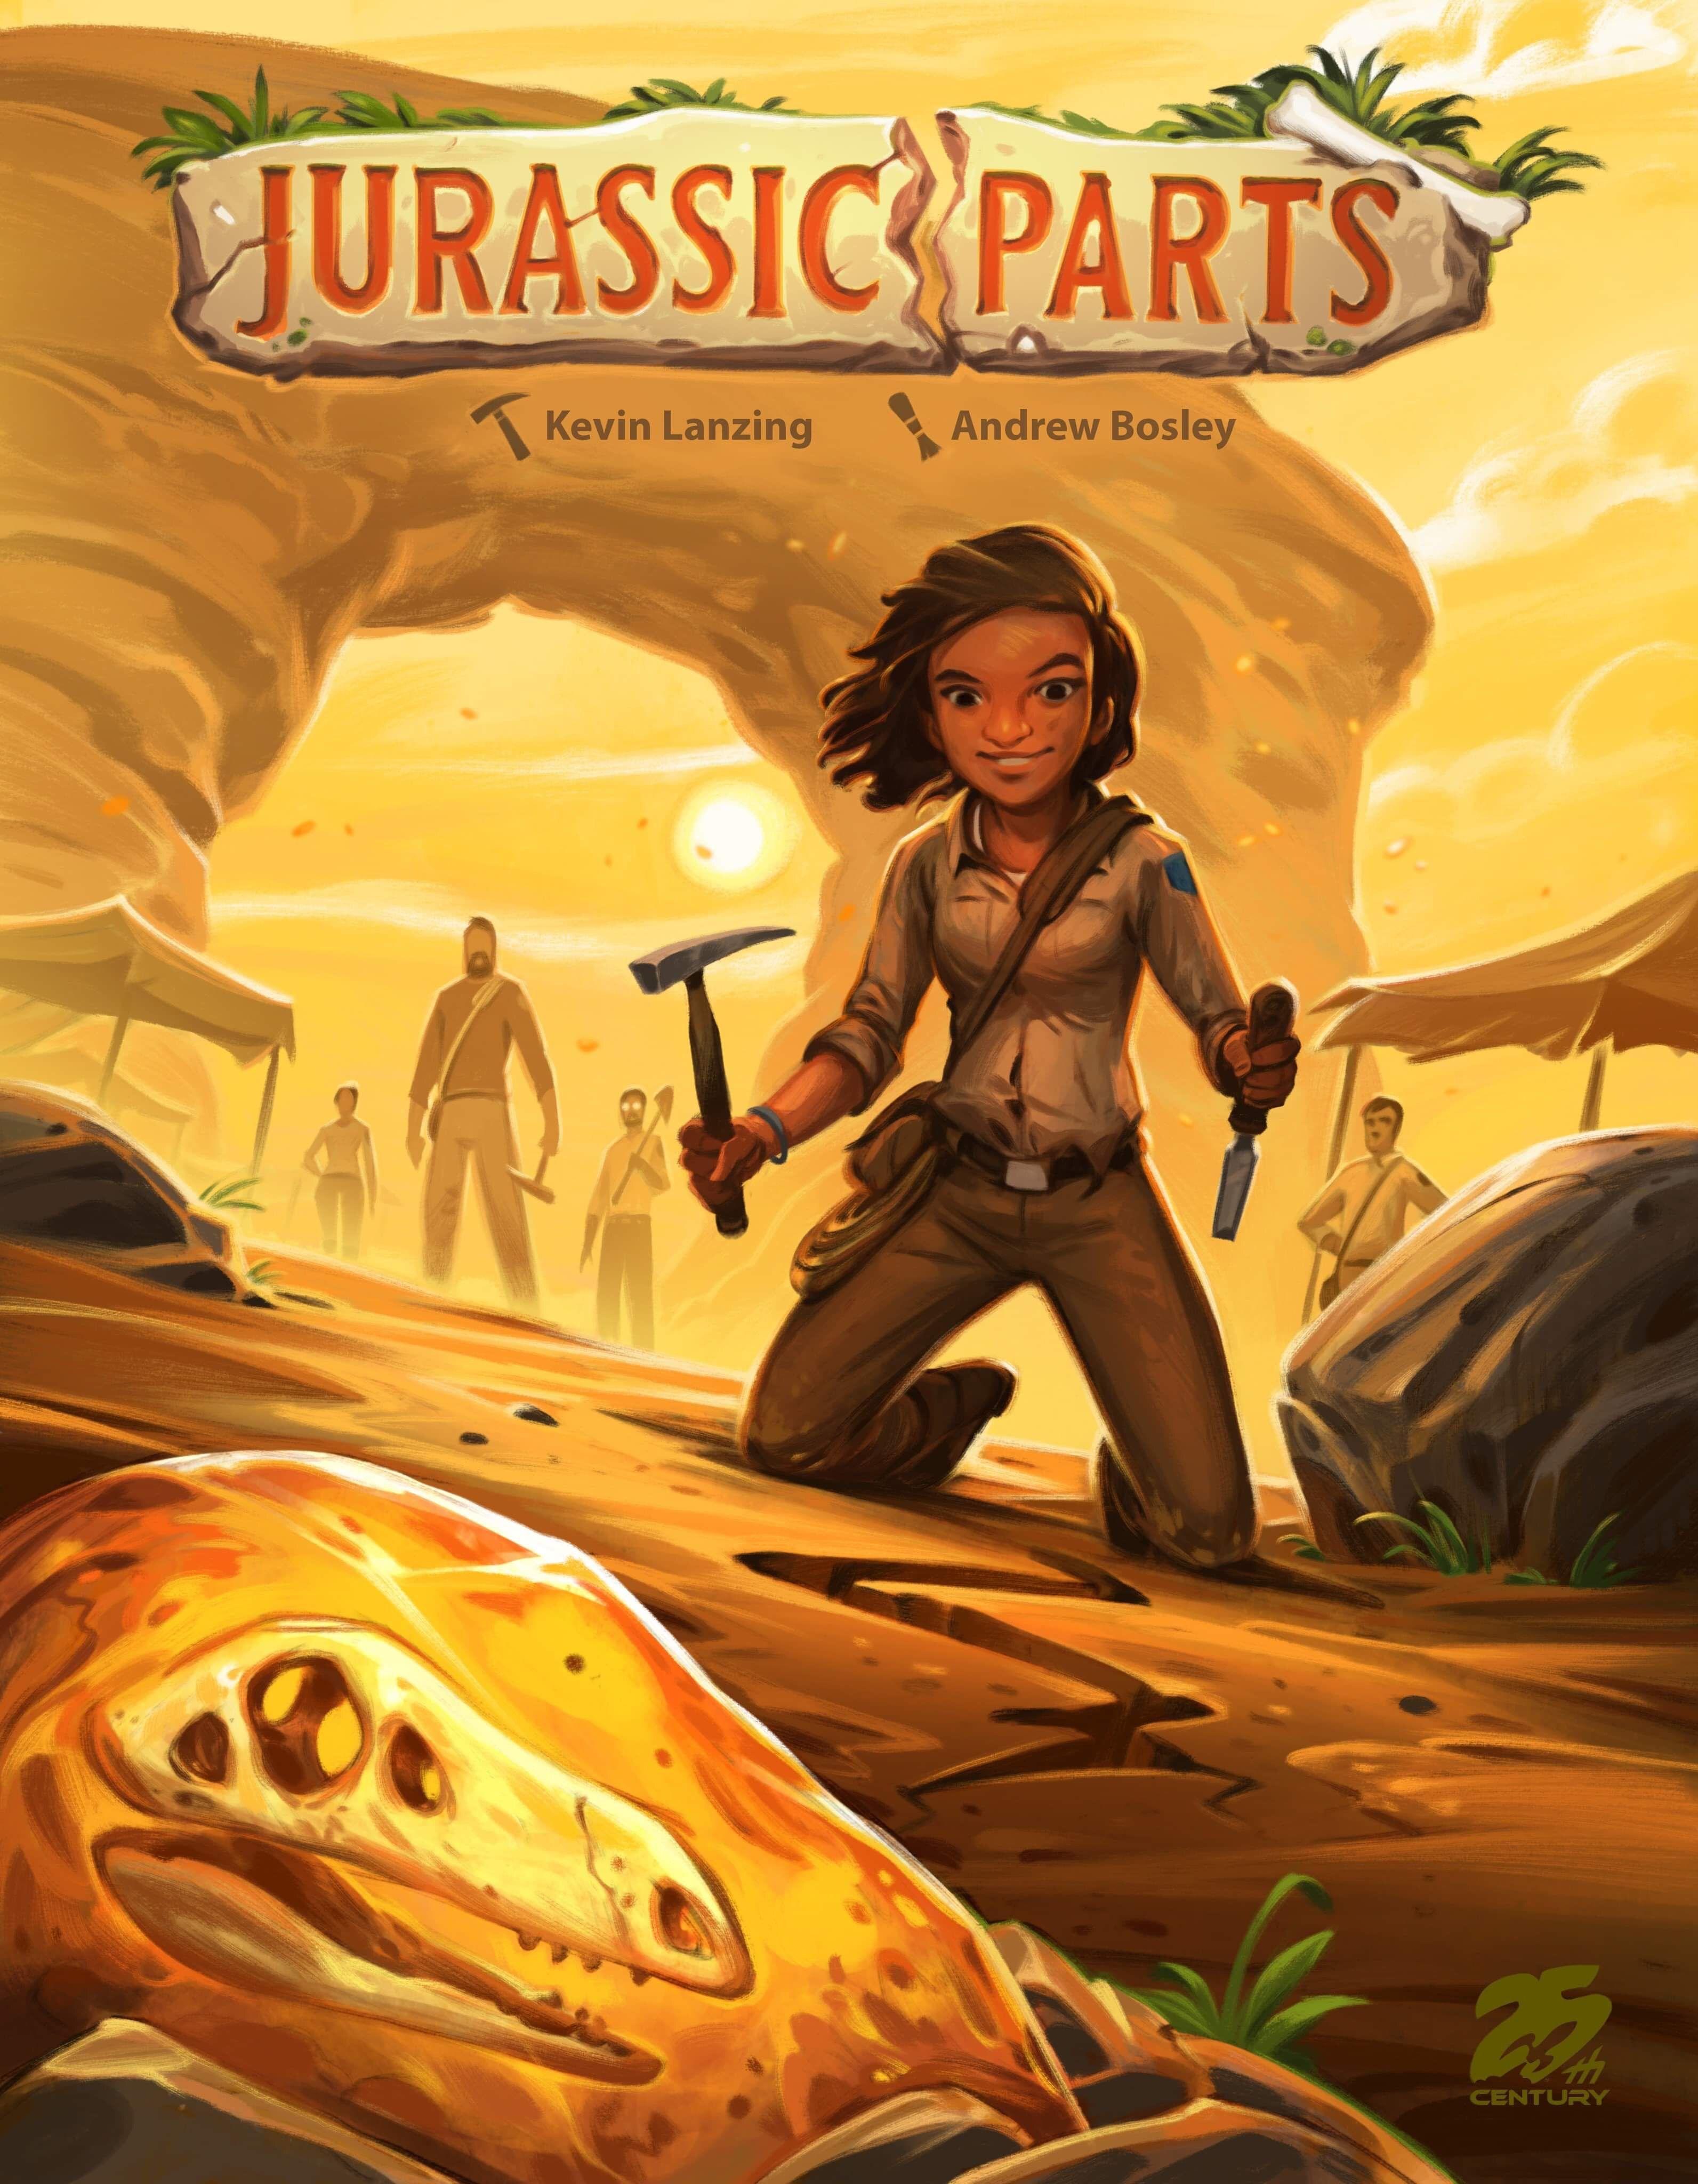 Jurassic Parts 2020 Board Game